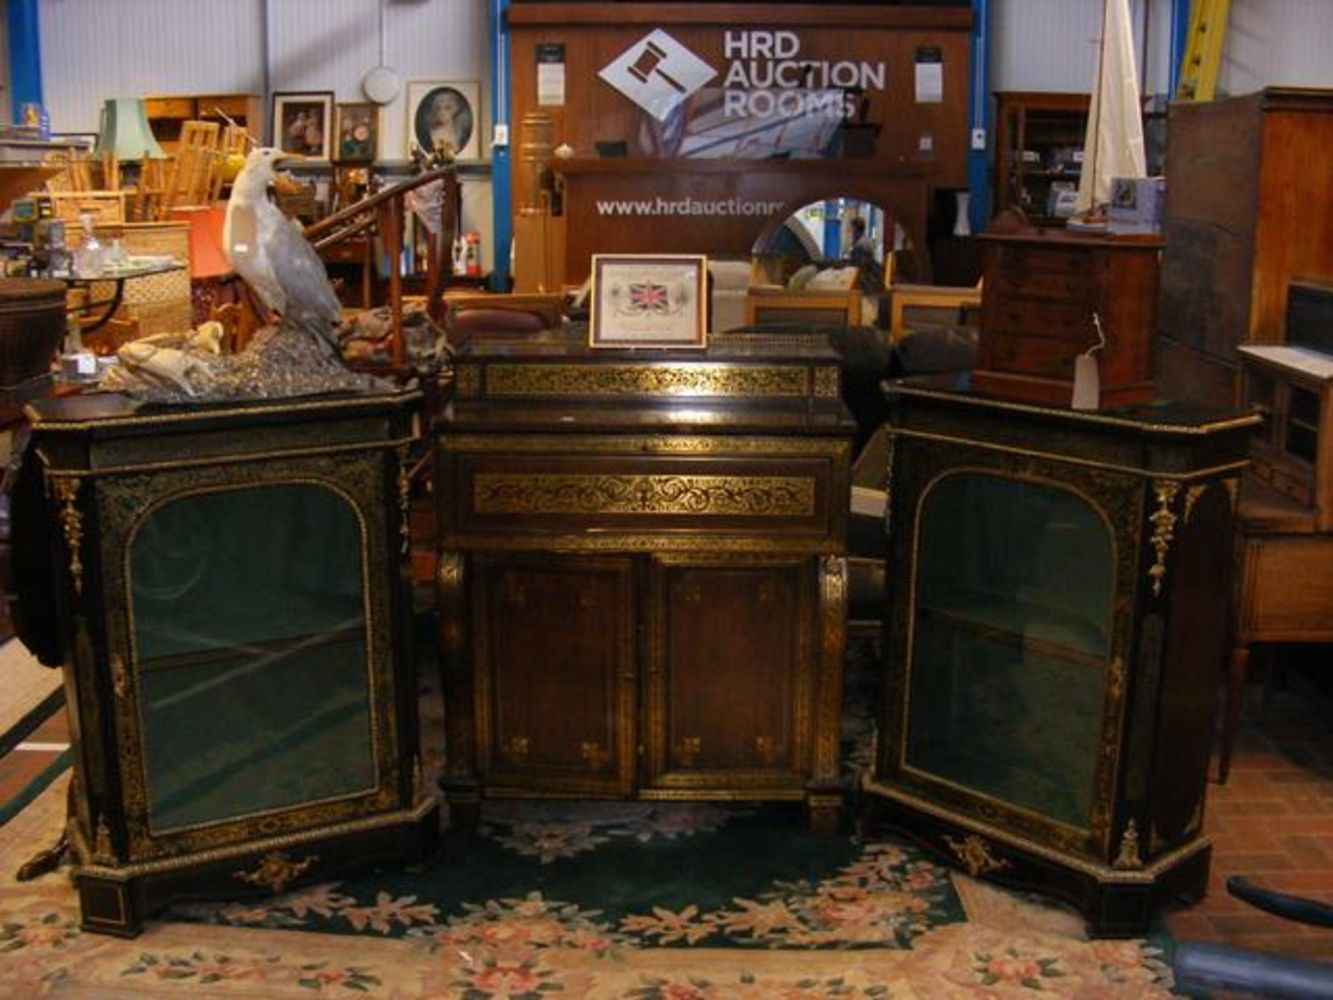 Antique, Collectables and Vintage - HRD Auction Rooms Ltd